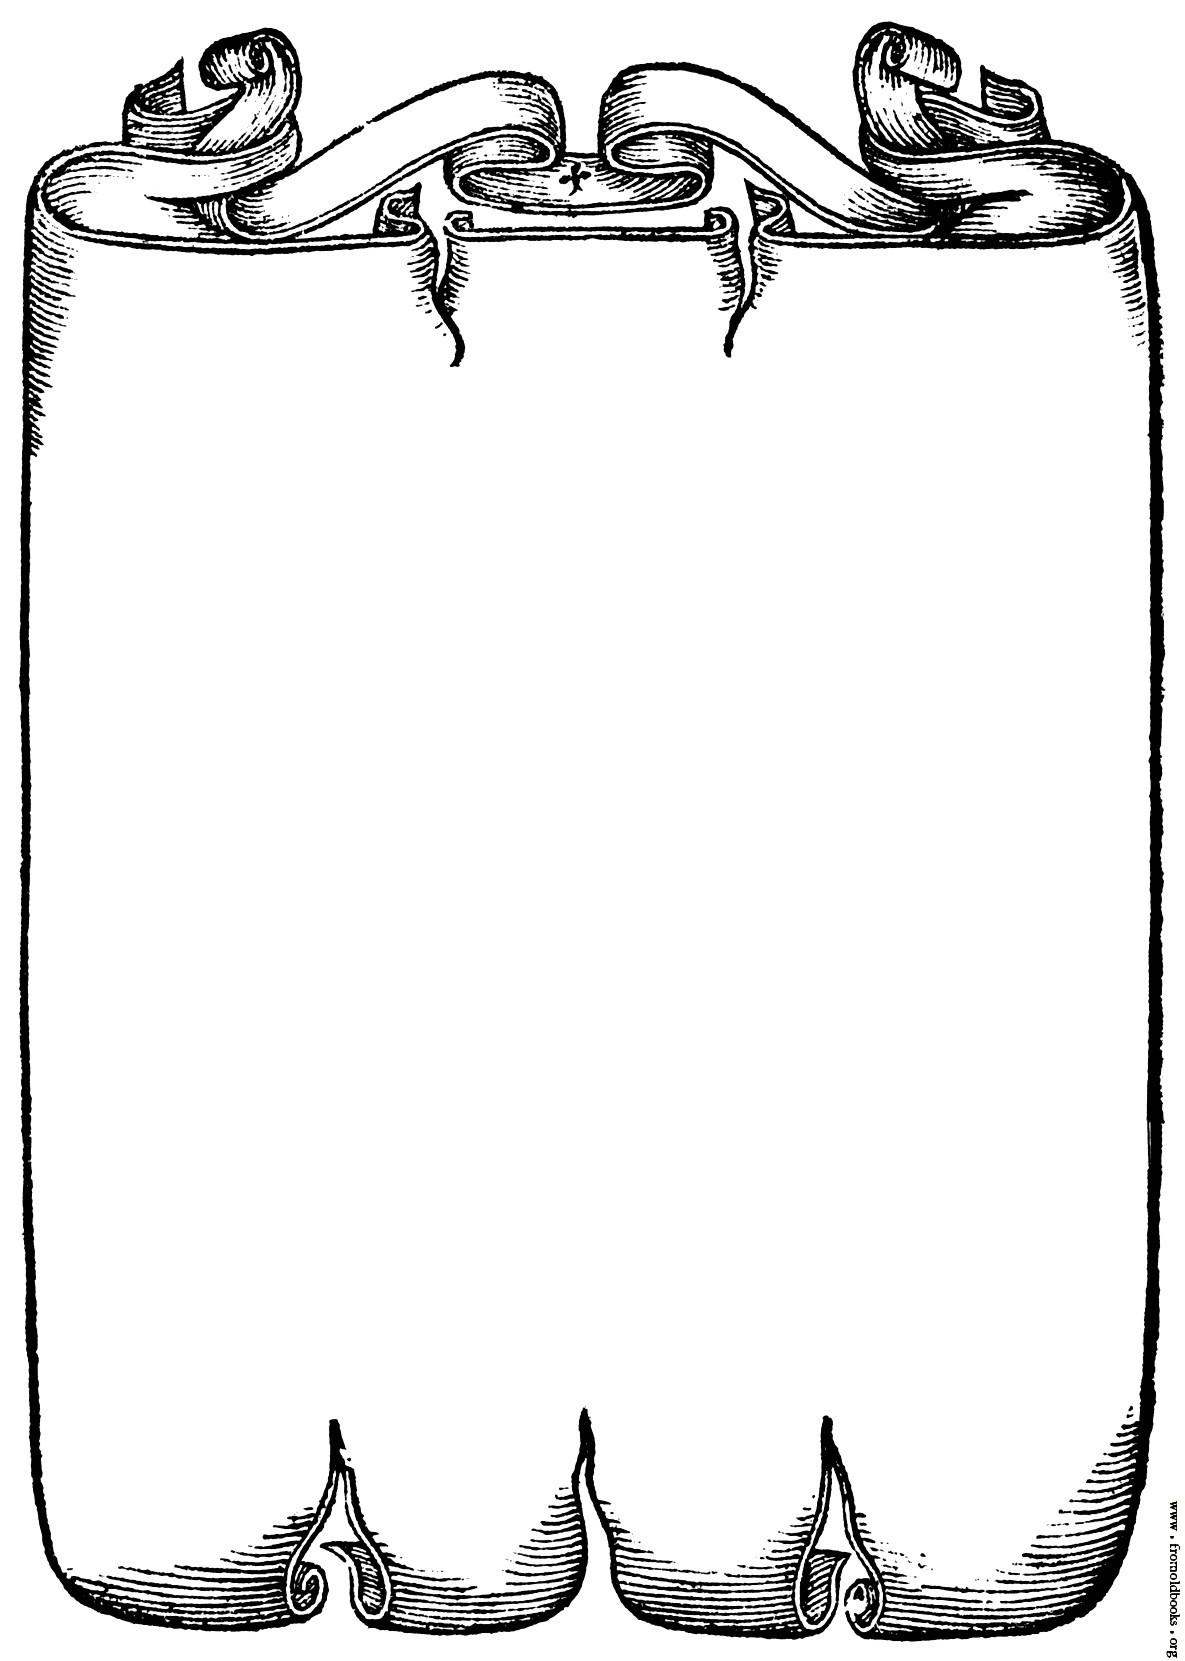 Medieval Clip Art Borders - ClipArt Best